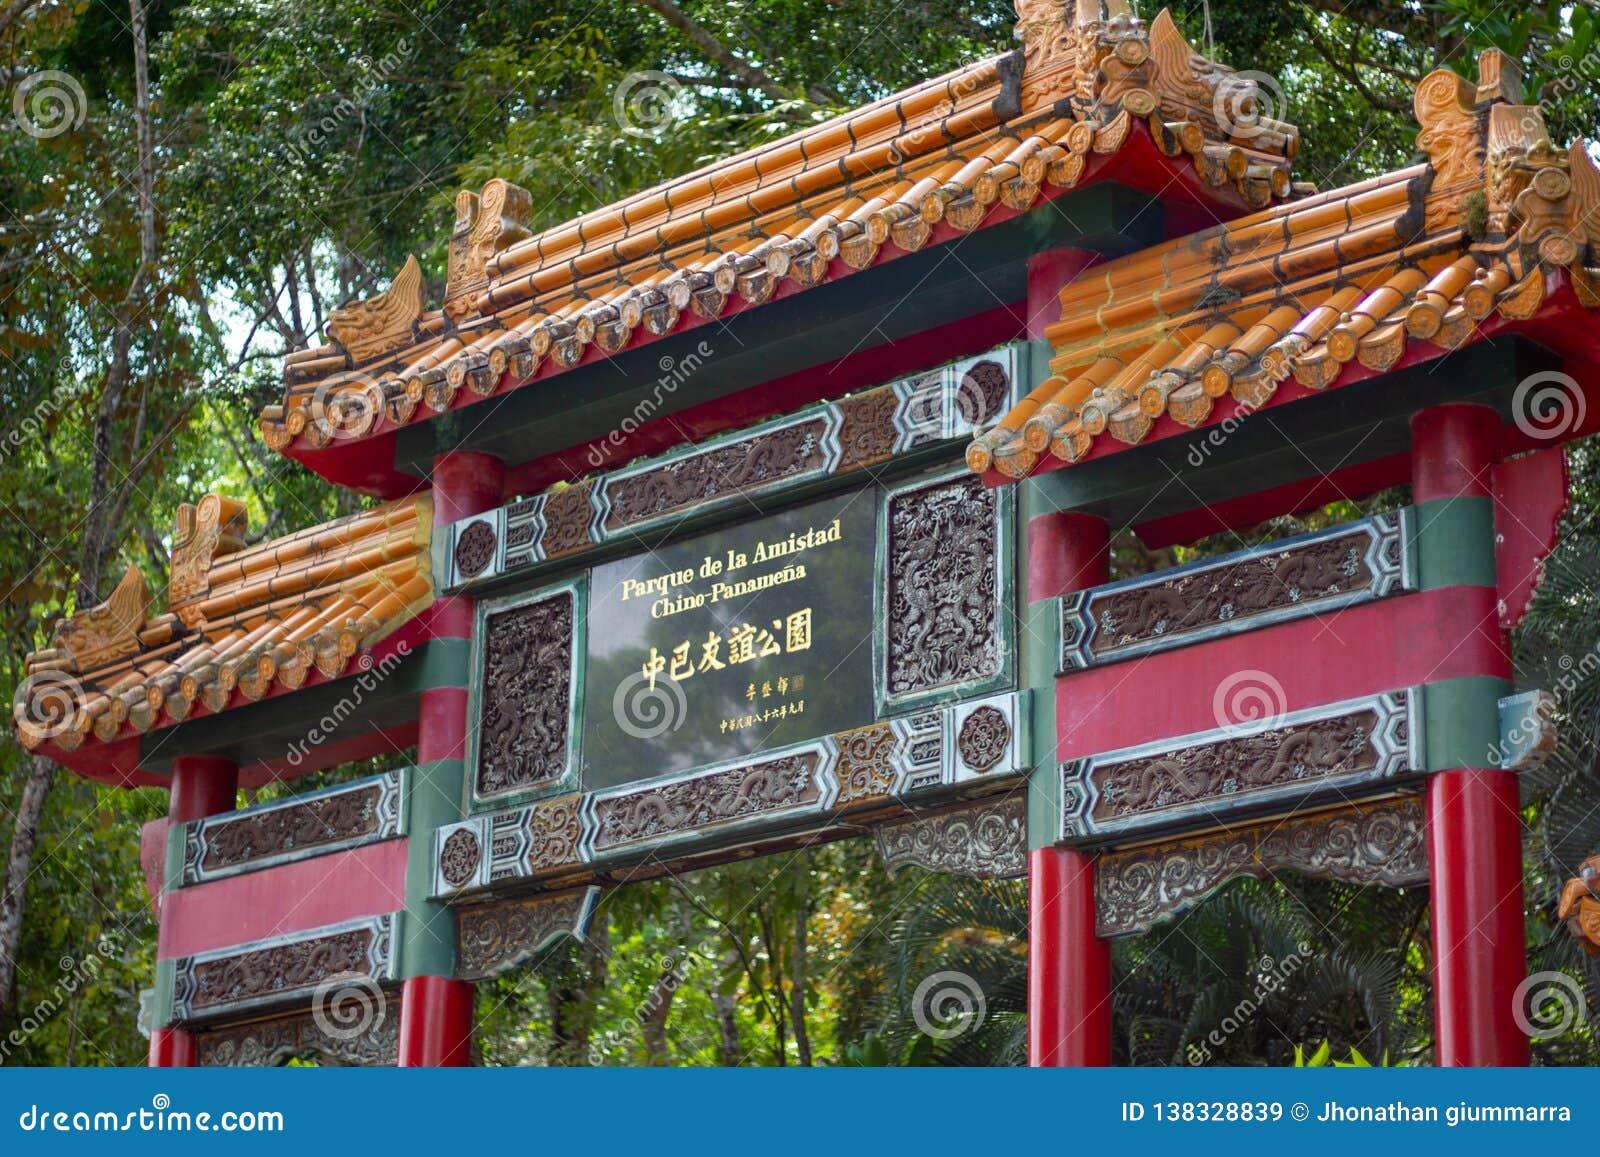 Parque da amizade chinesa panamense